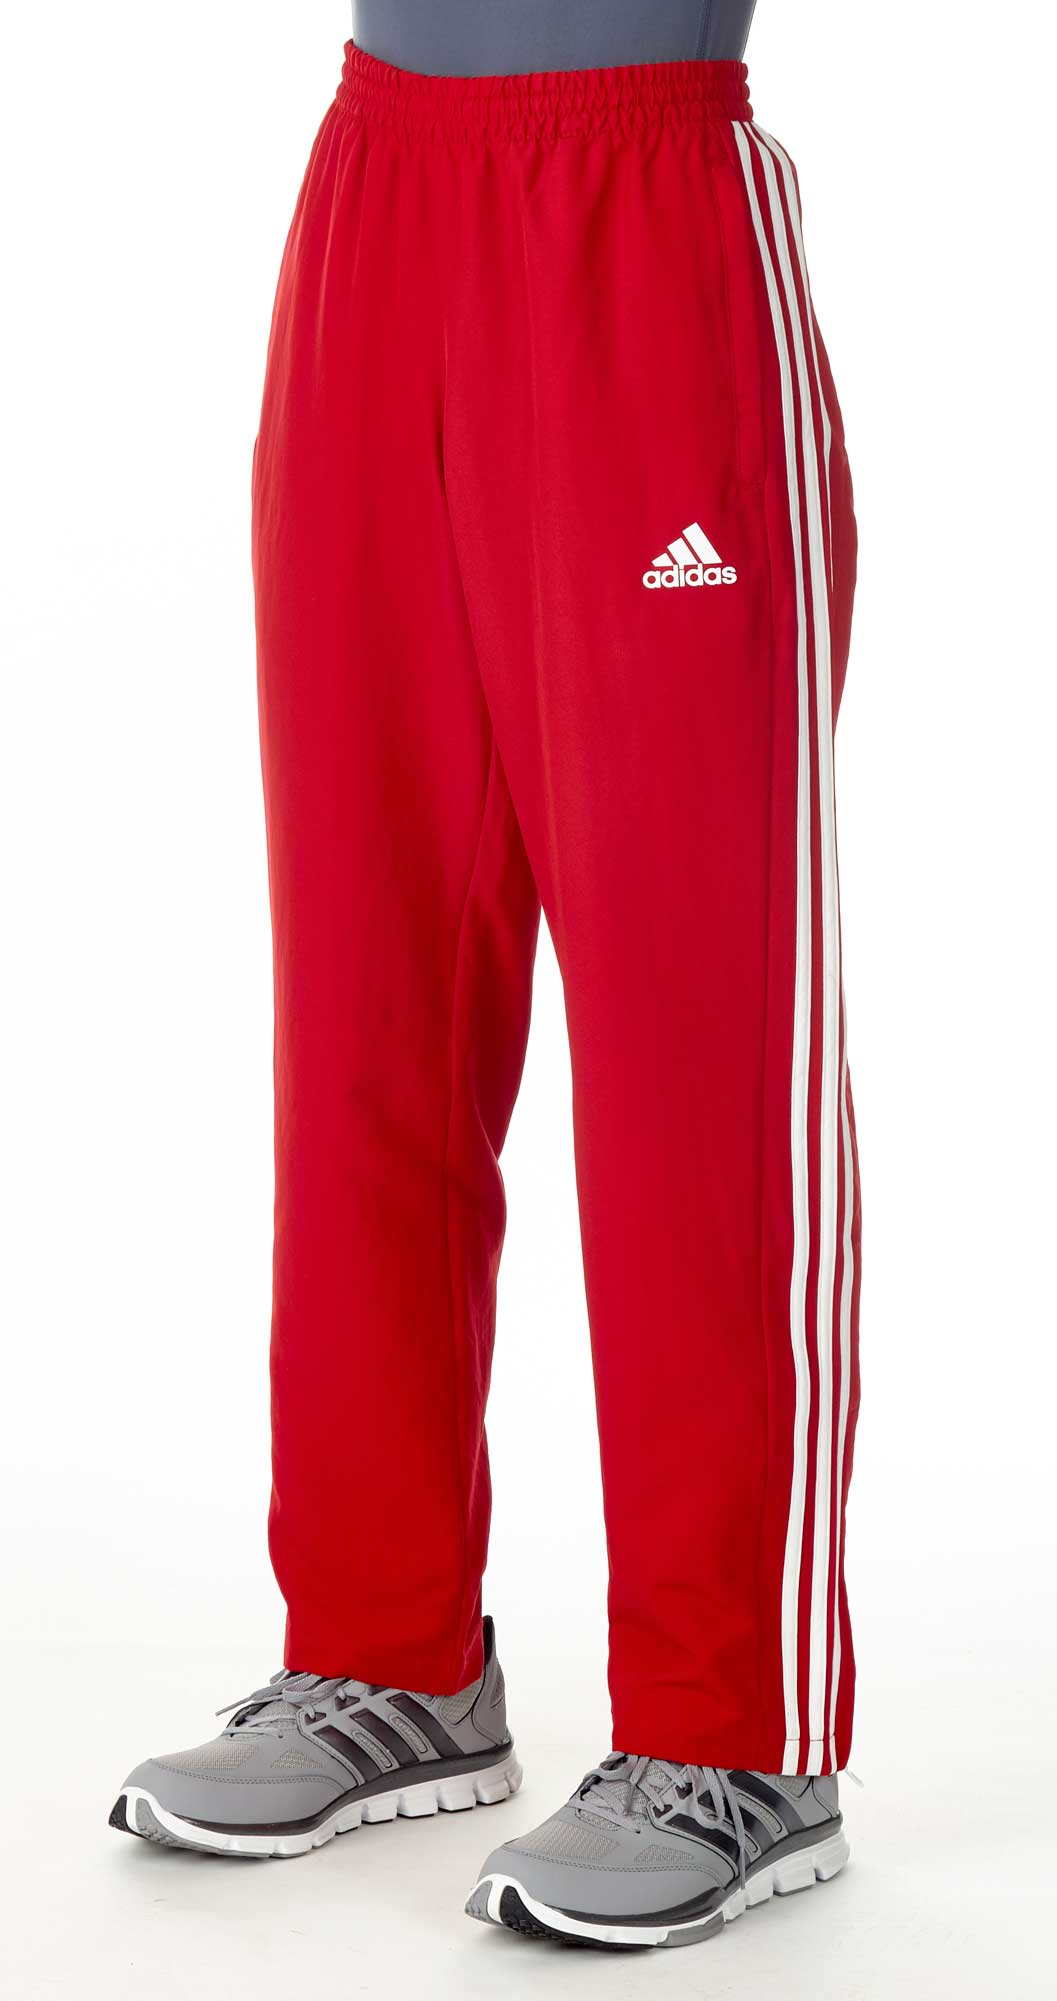 a88dd880dfd6ae Vorschau  adidas T16 Team Hose Männer power rot   weiß